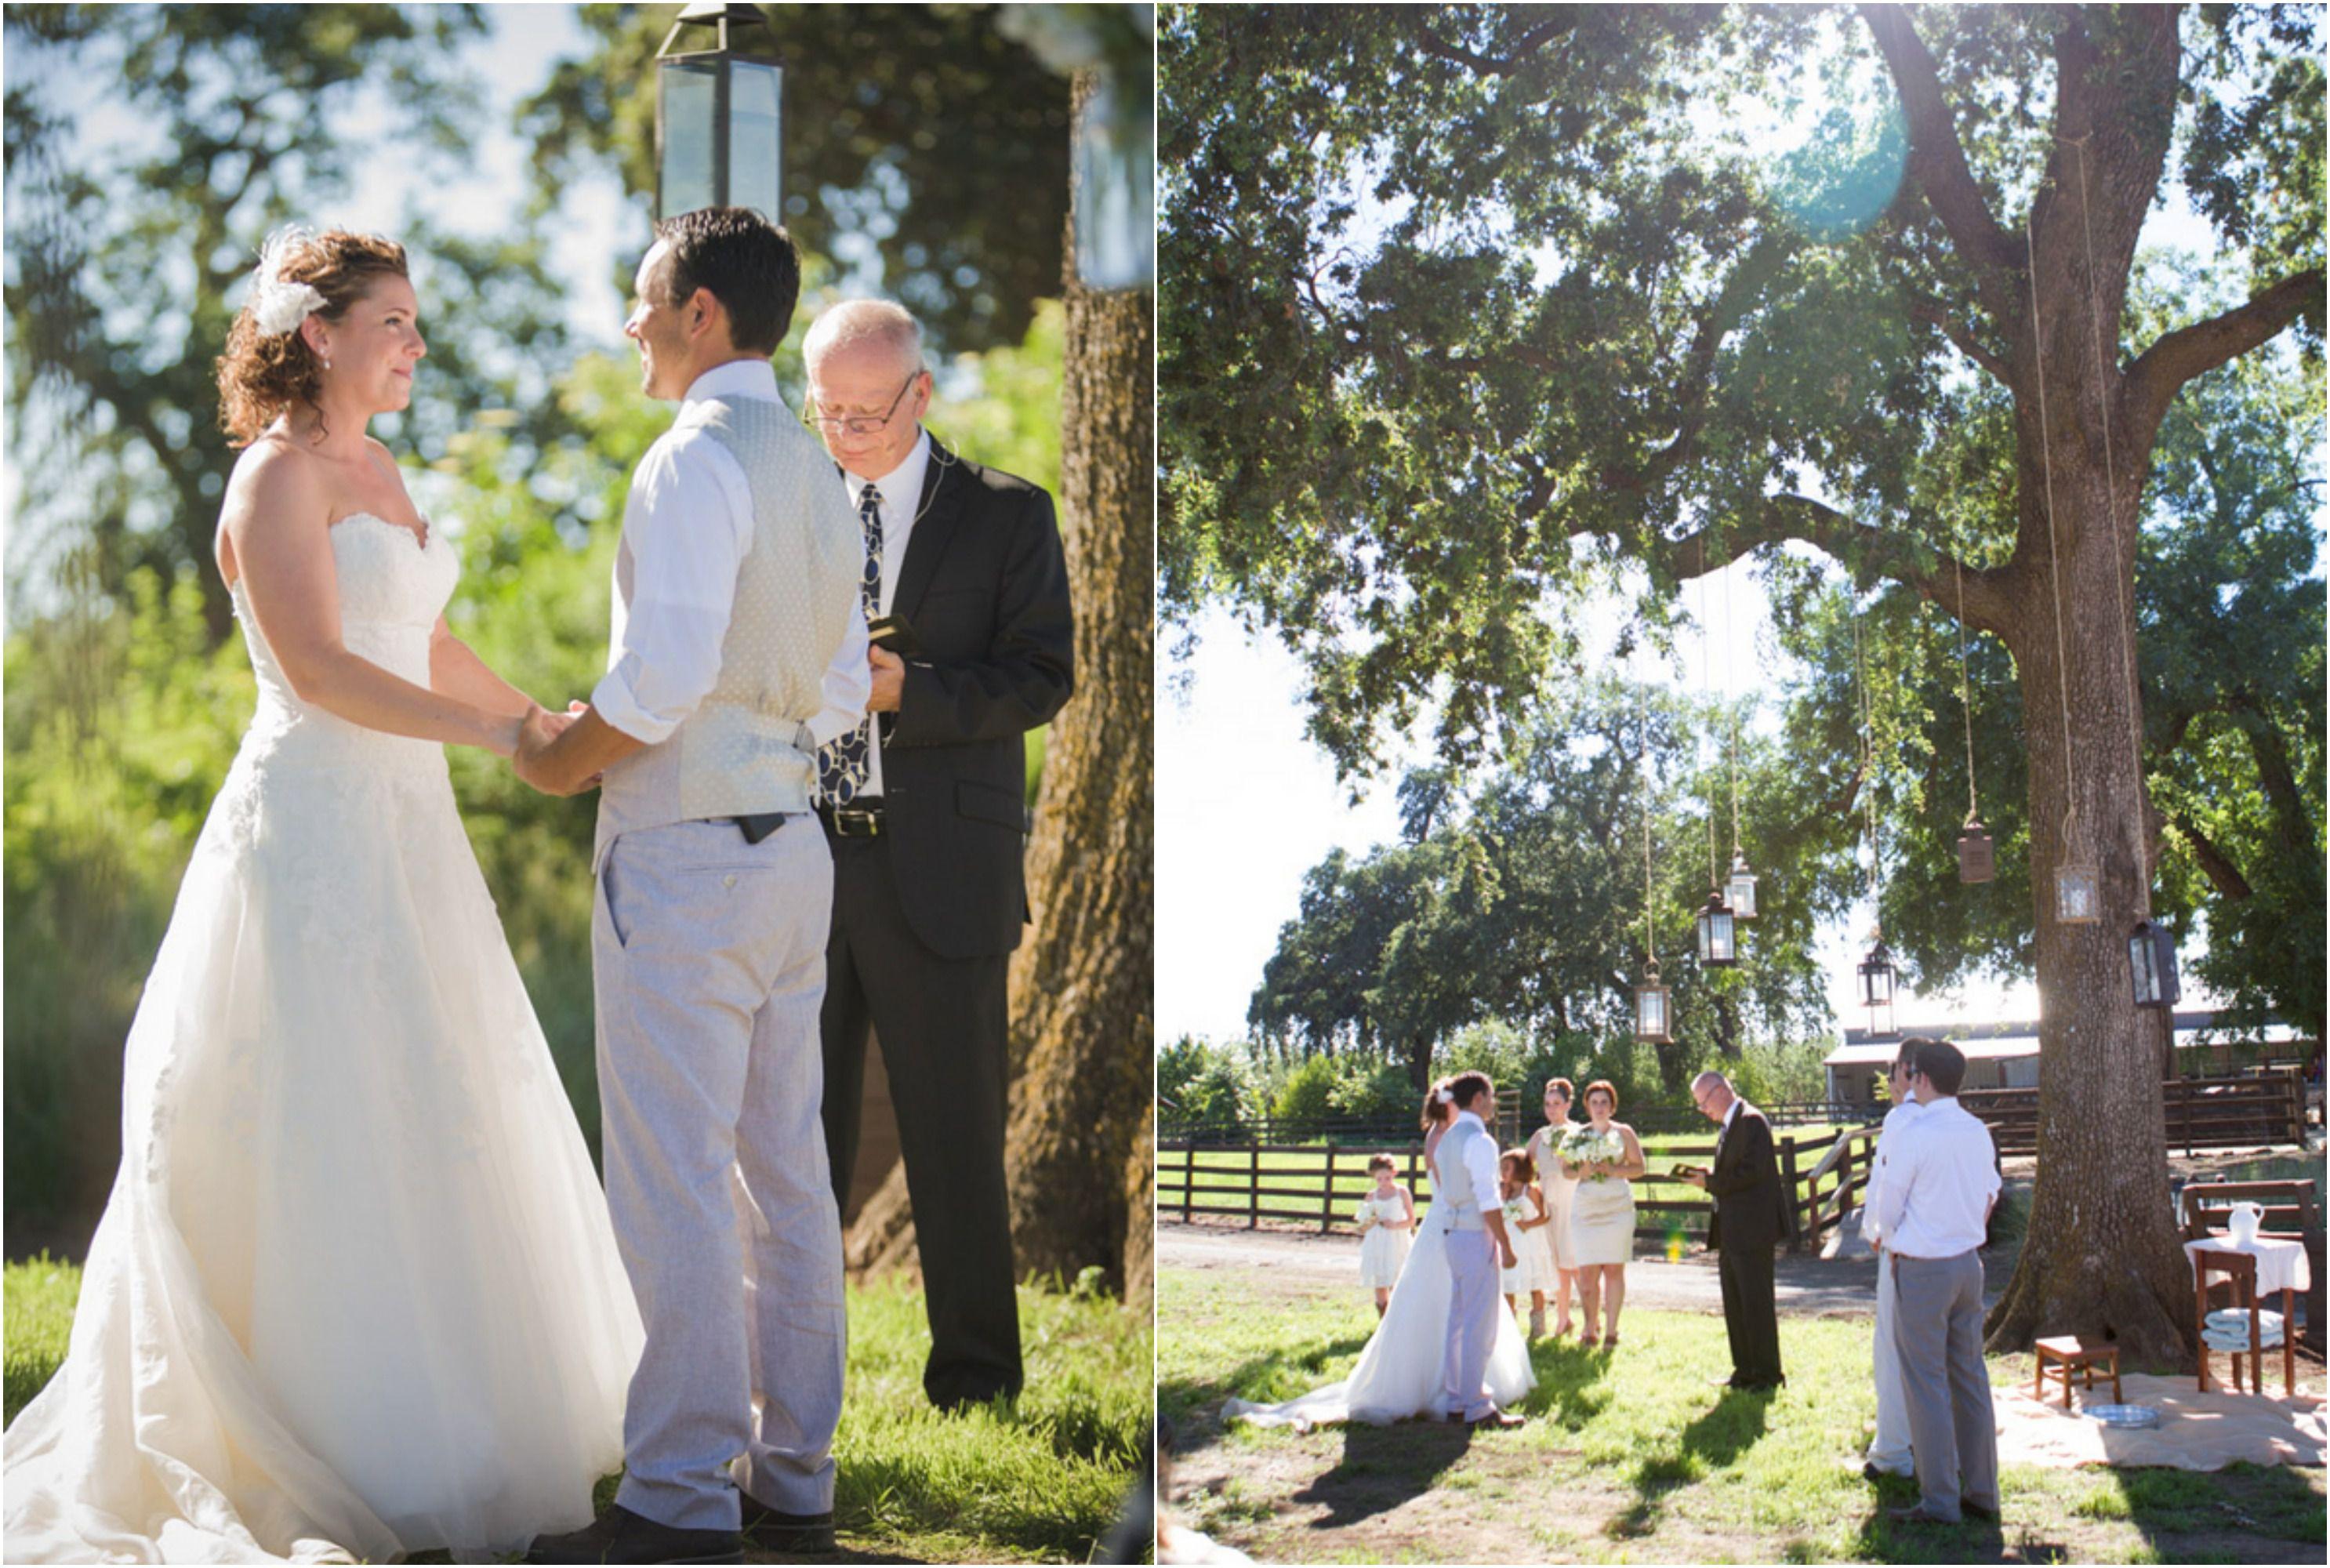 Country Ranch Wedding In California Rustic Wedding Chic